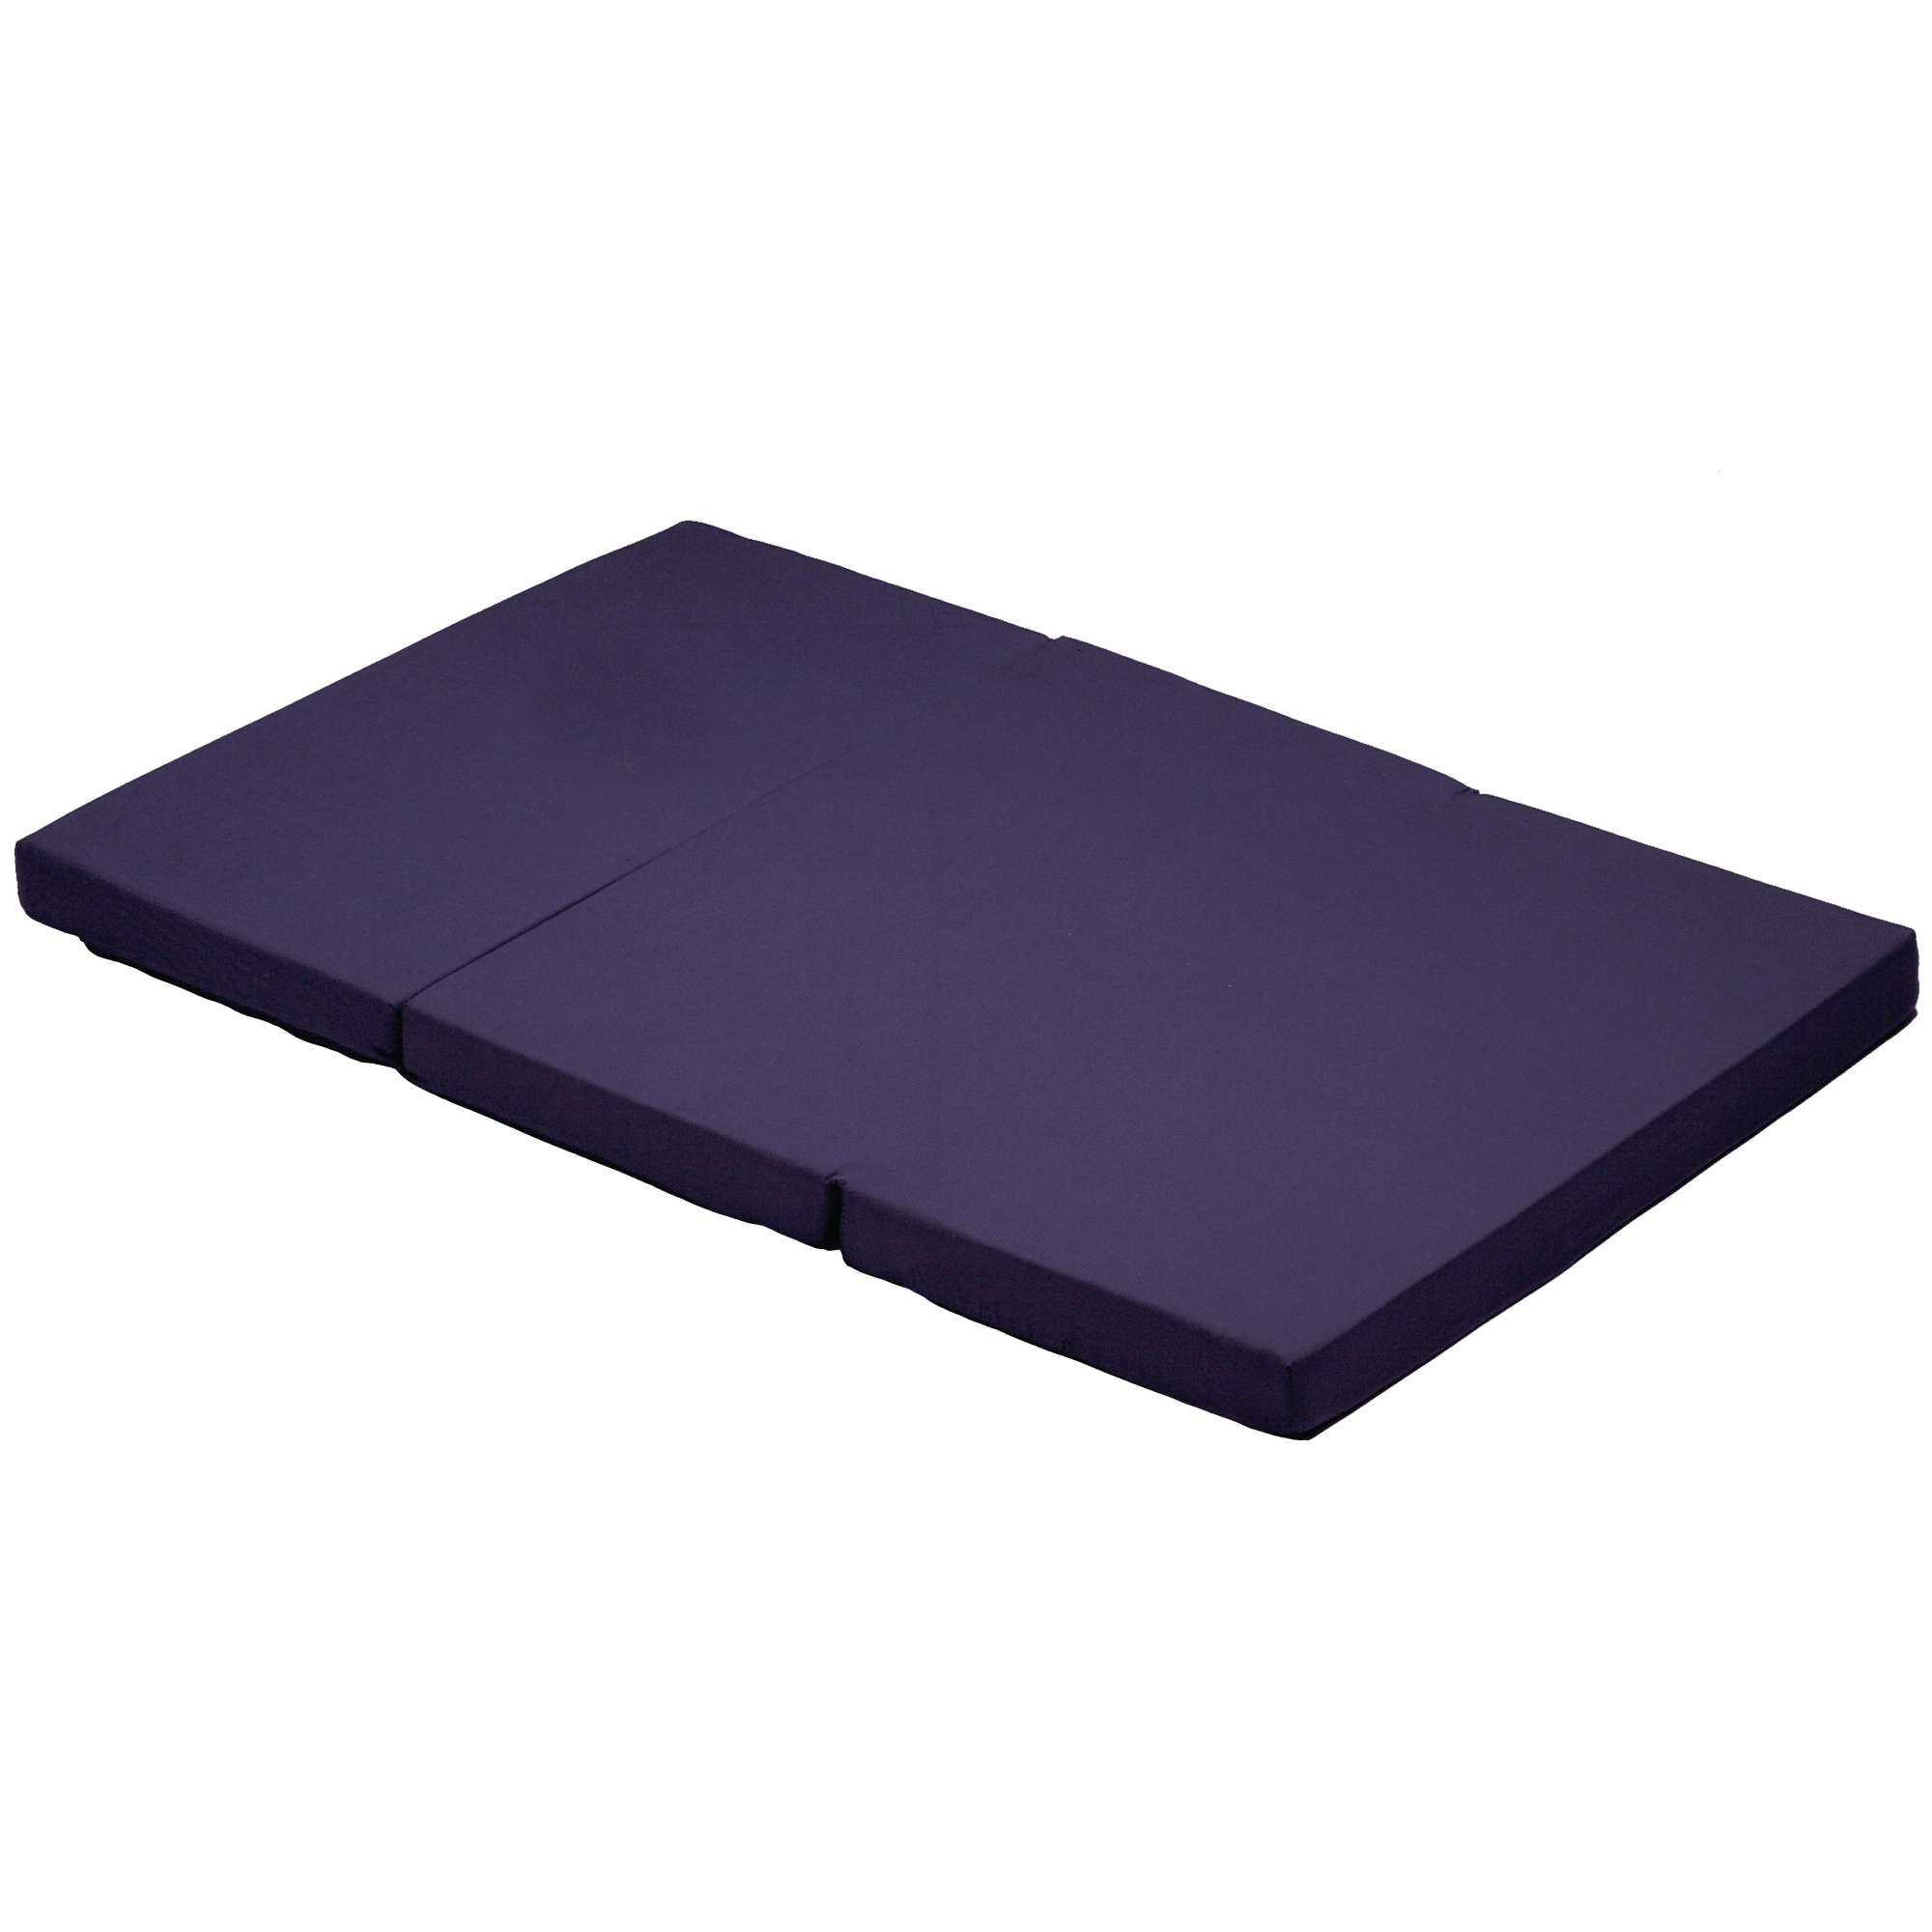 60 x 120 x 6 cm - Skum og polyester - Med transporttaske